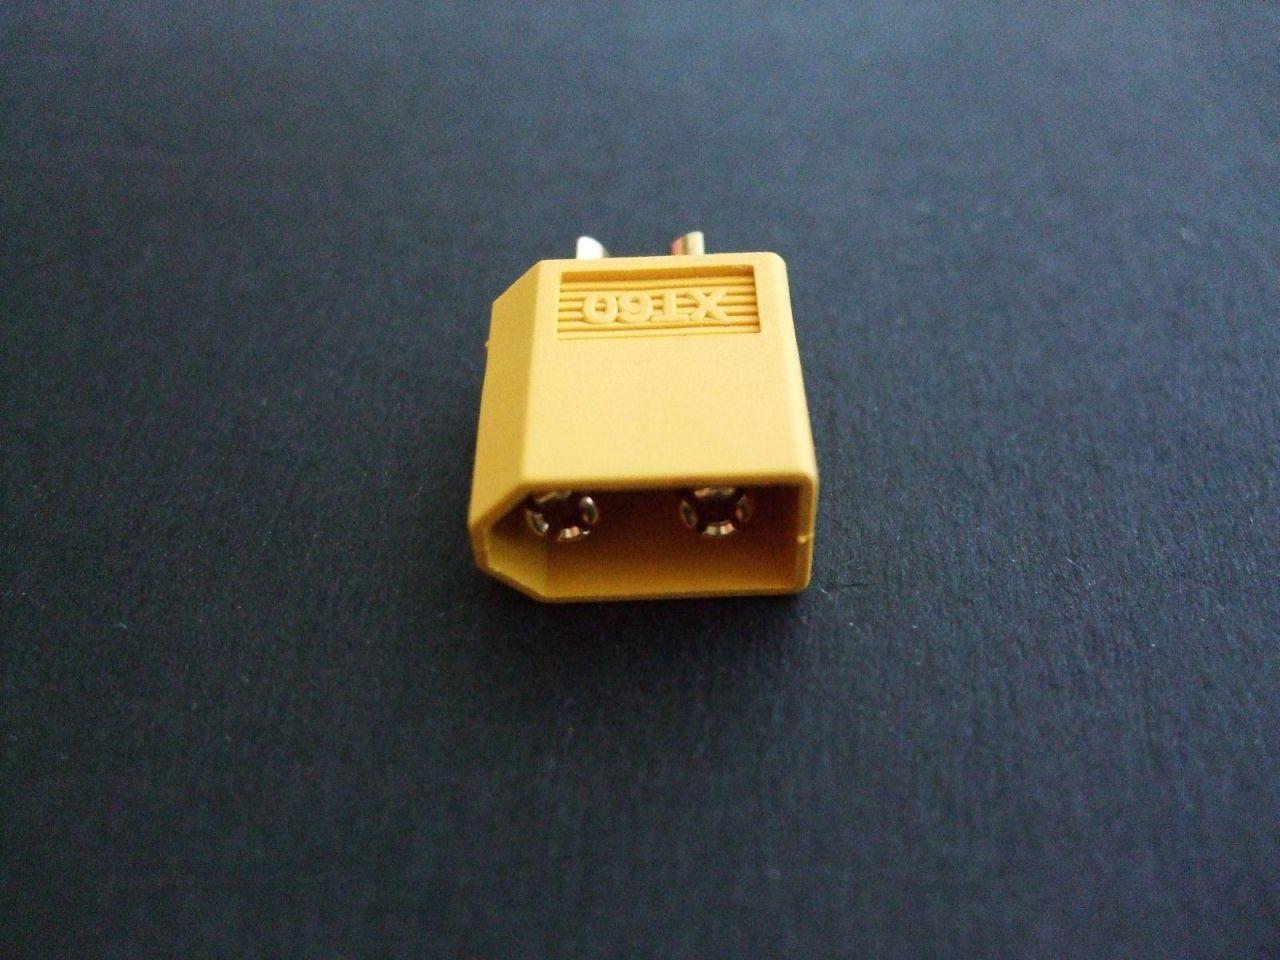 1x XT60 Stecker passend für Turnigy Zippy LiPo XT 60